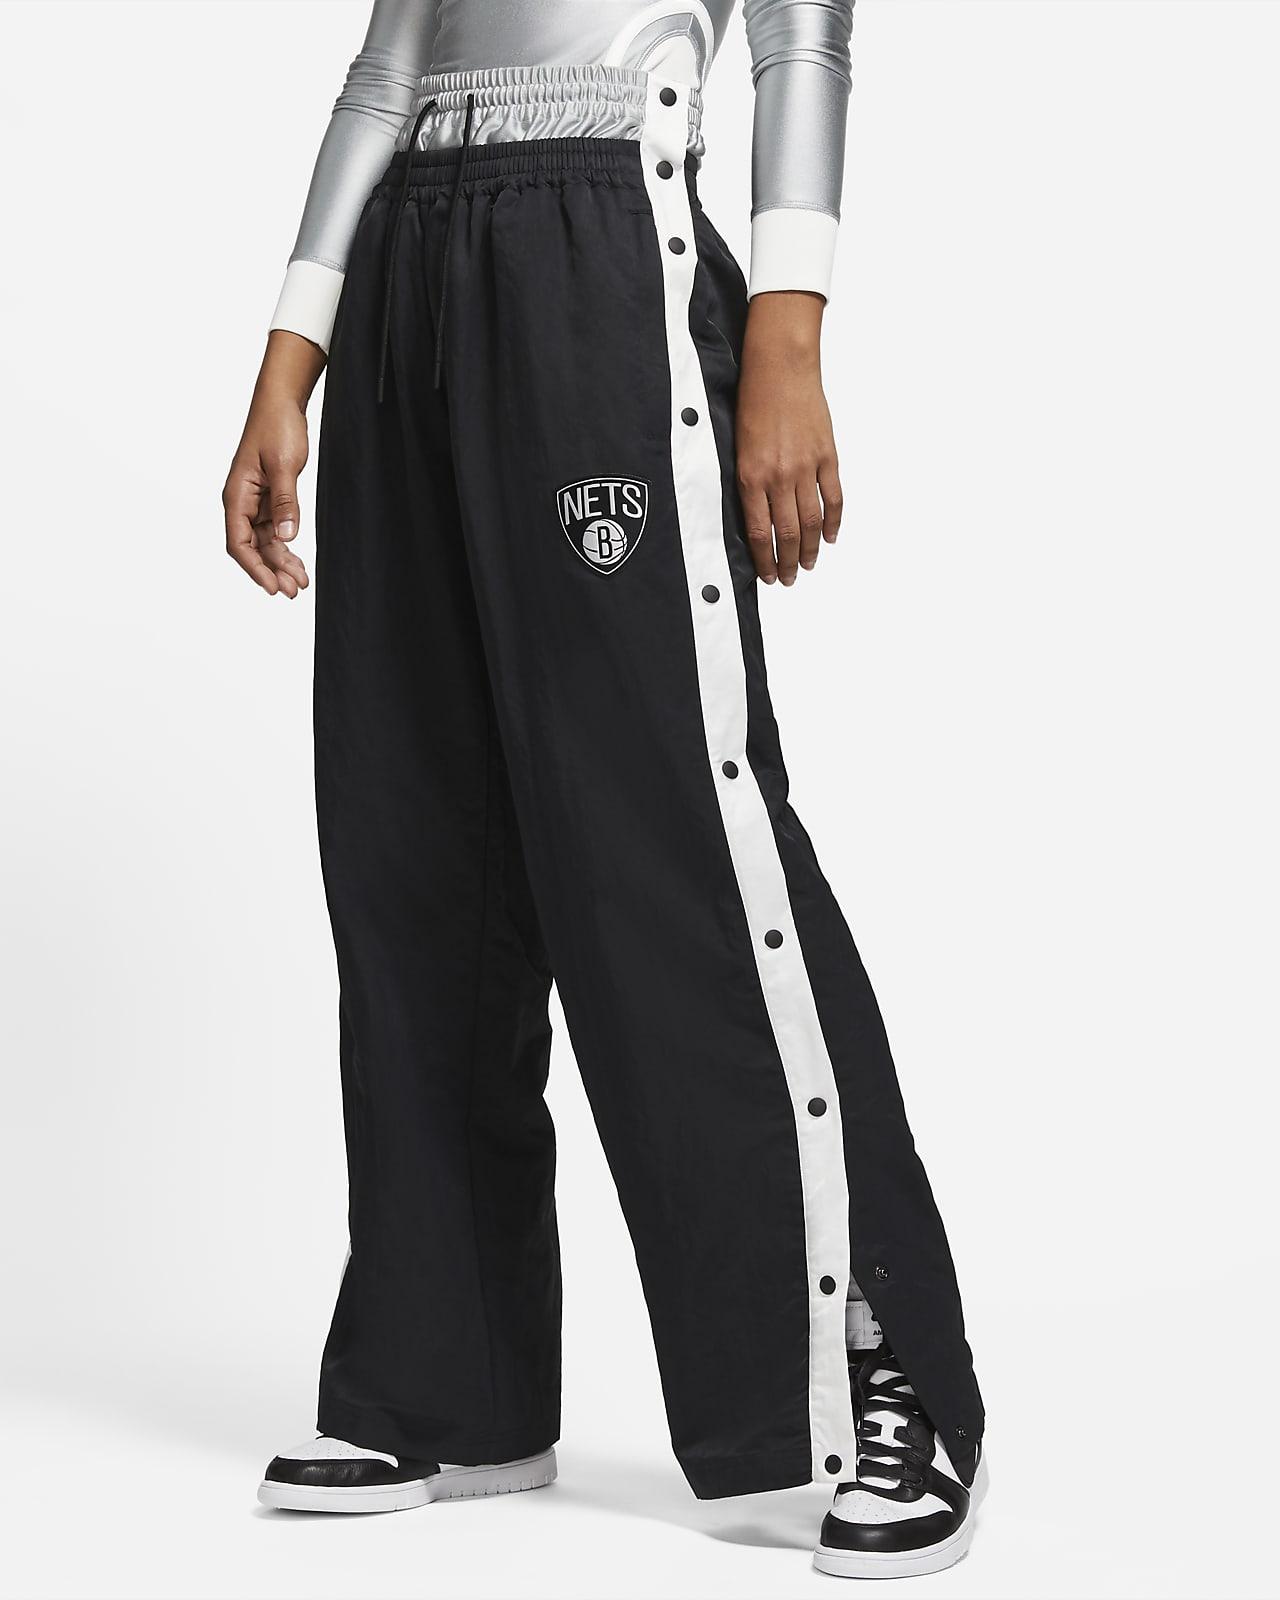 Nike x AMBUSH® Women's Tearaway Pants